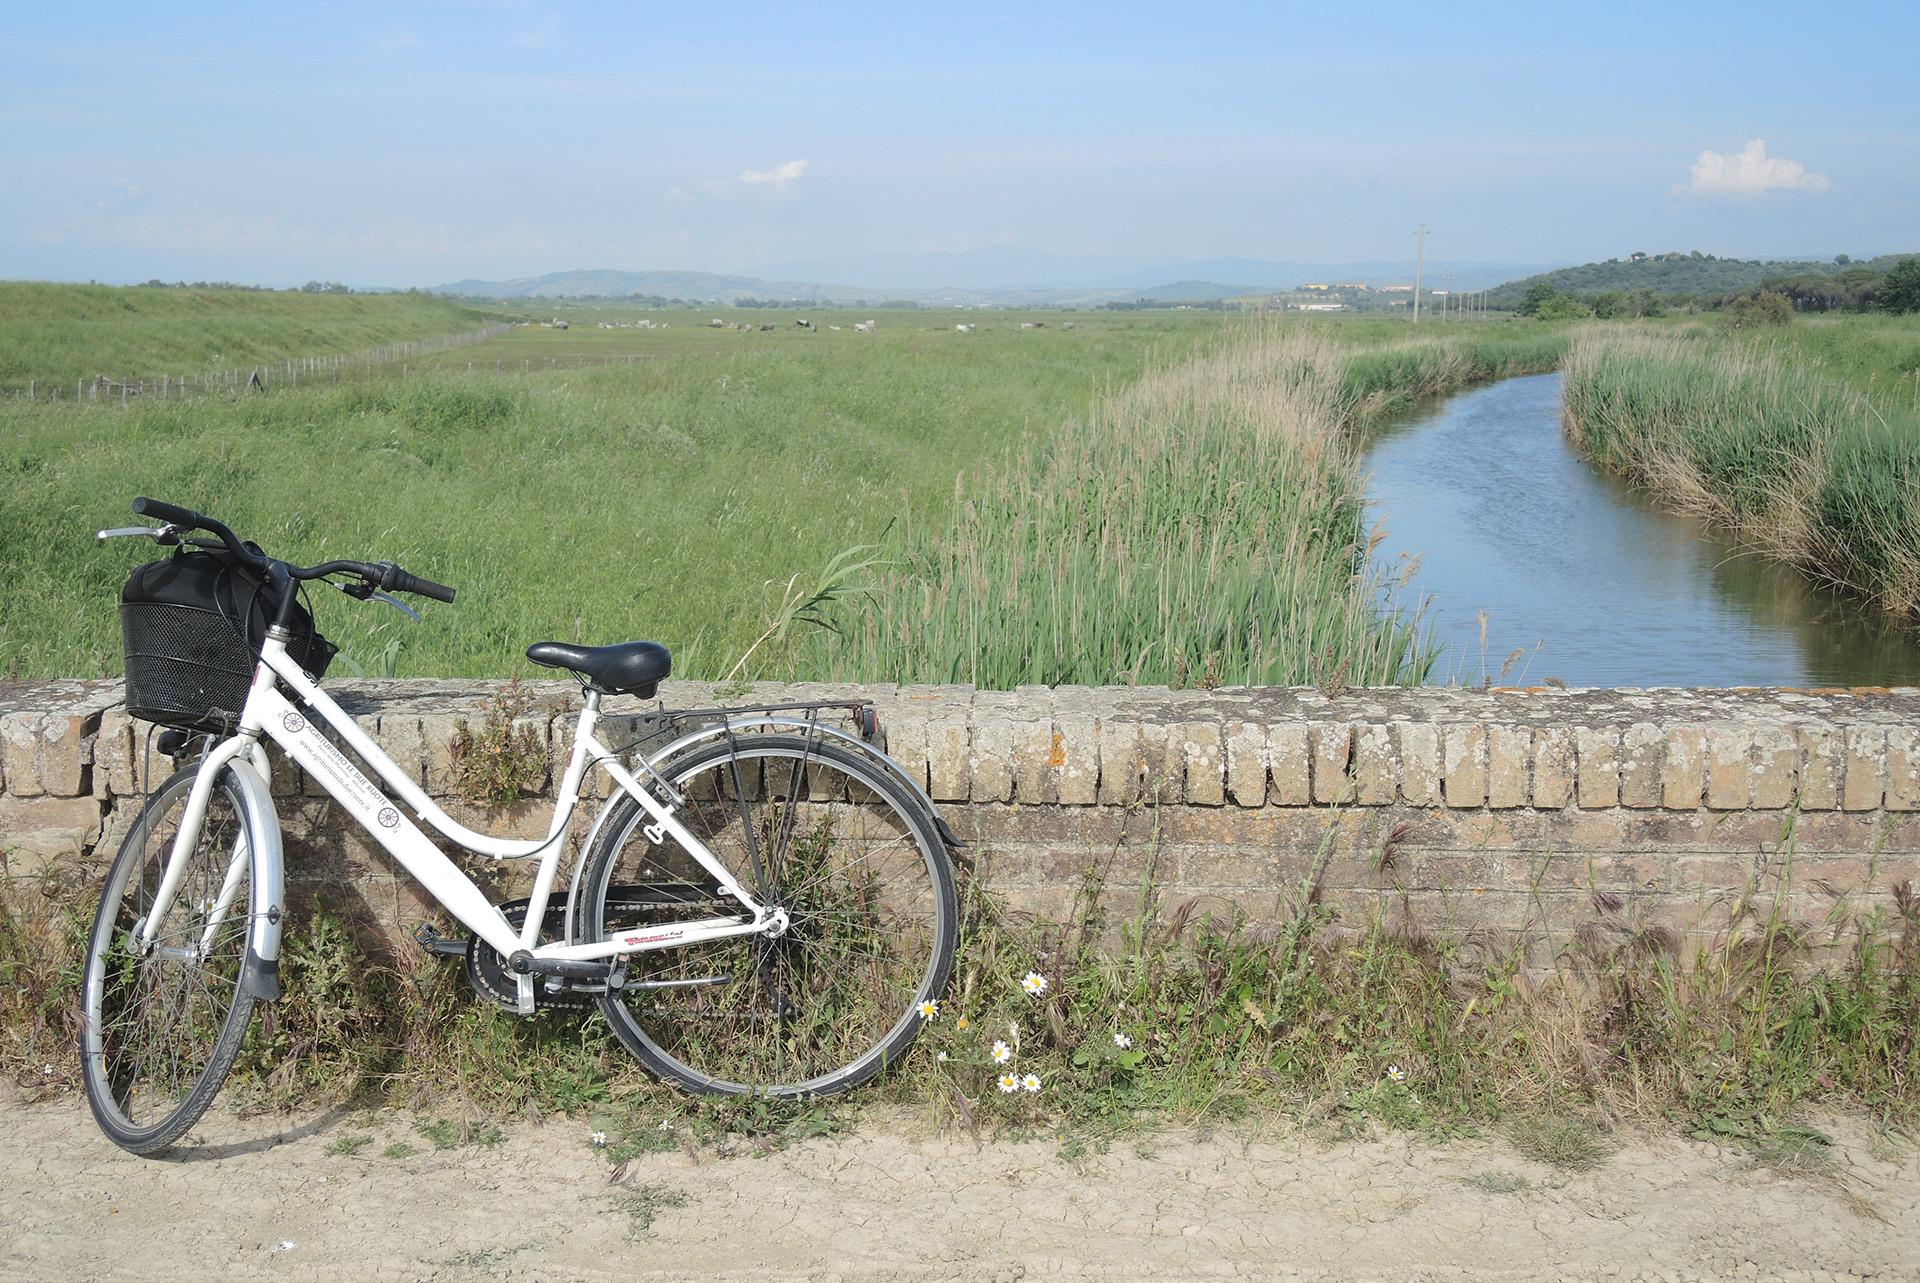 bici al parco uccellina